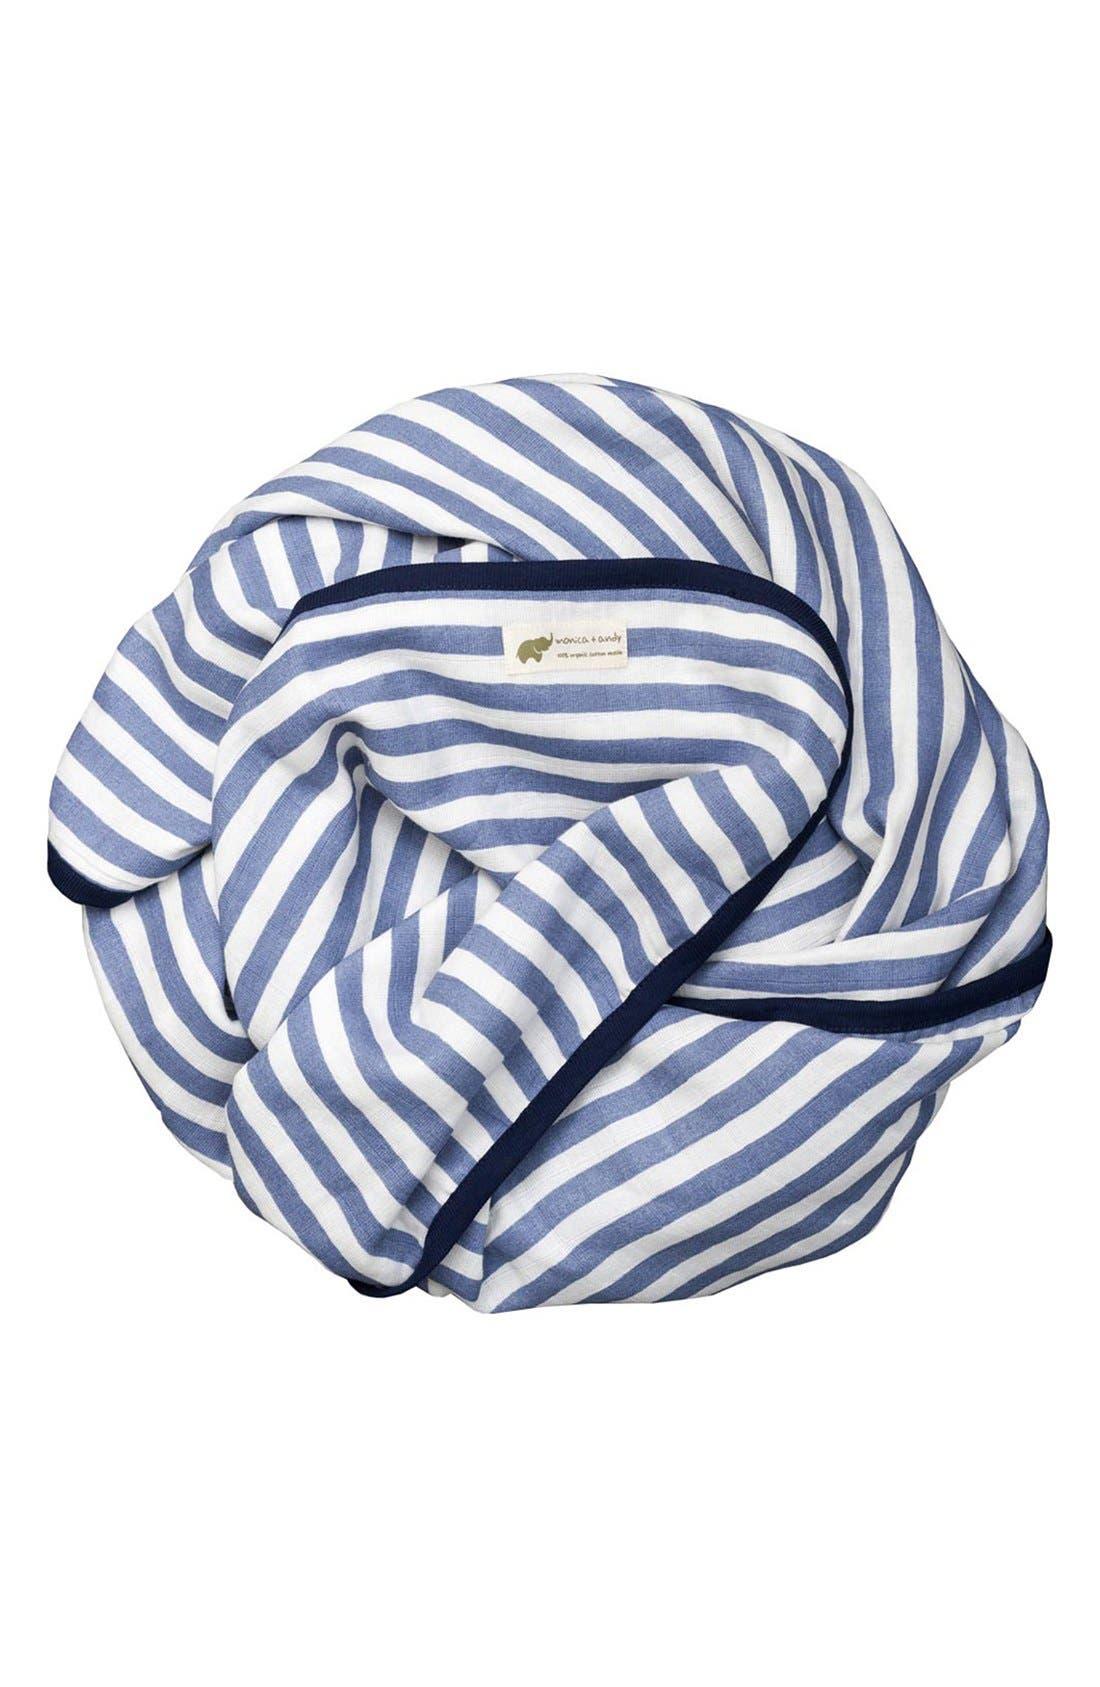 Organic Cotton Muslin Blanket,                             Main thumbnail 1, color,                             Blue Stripe